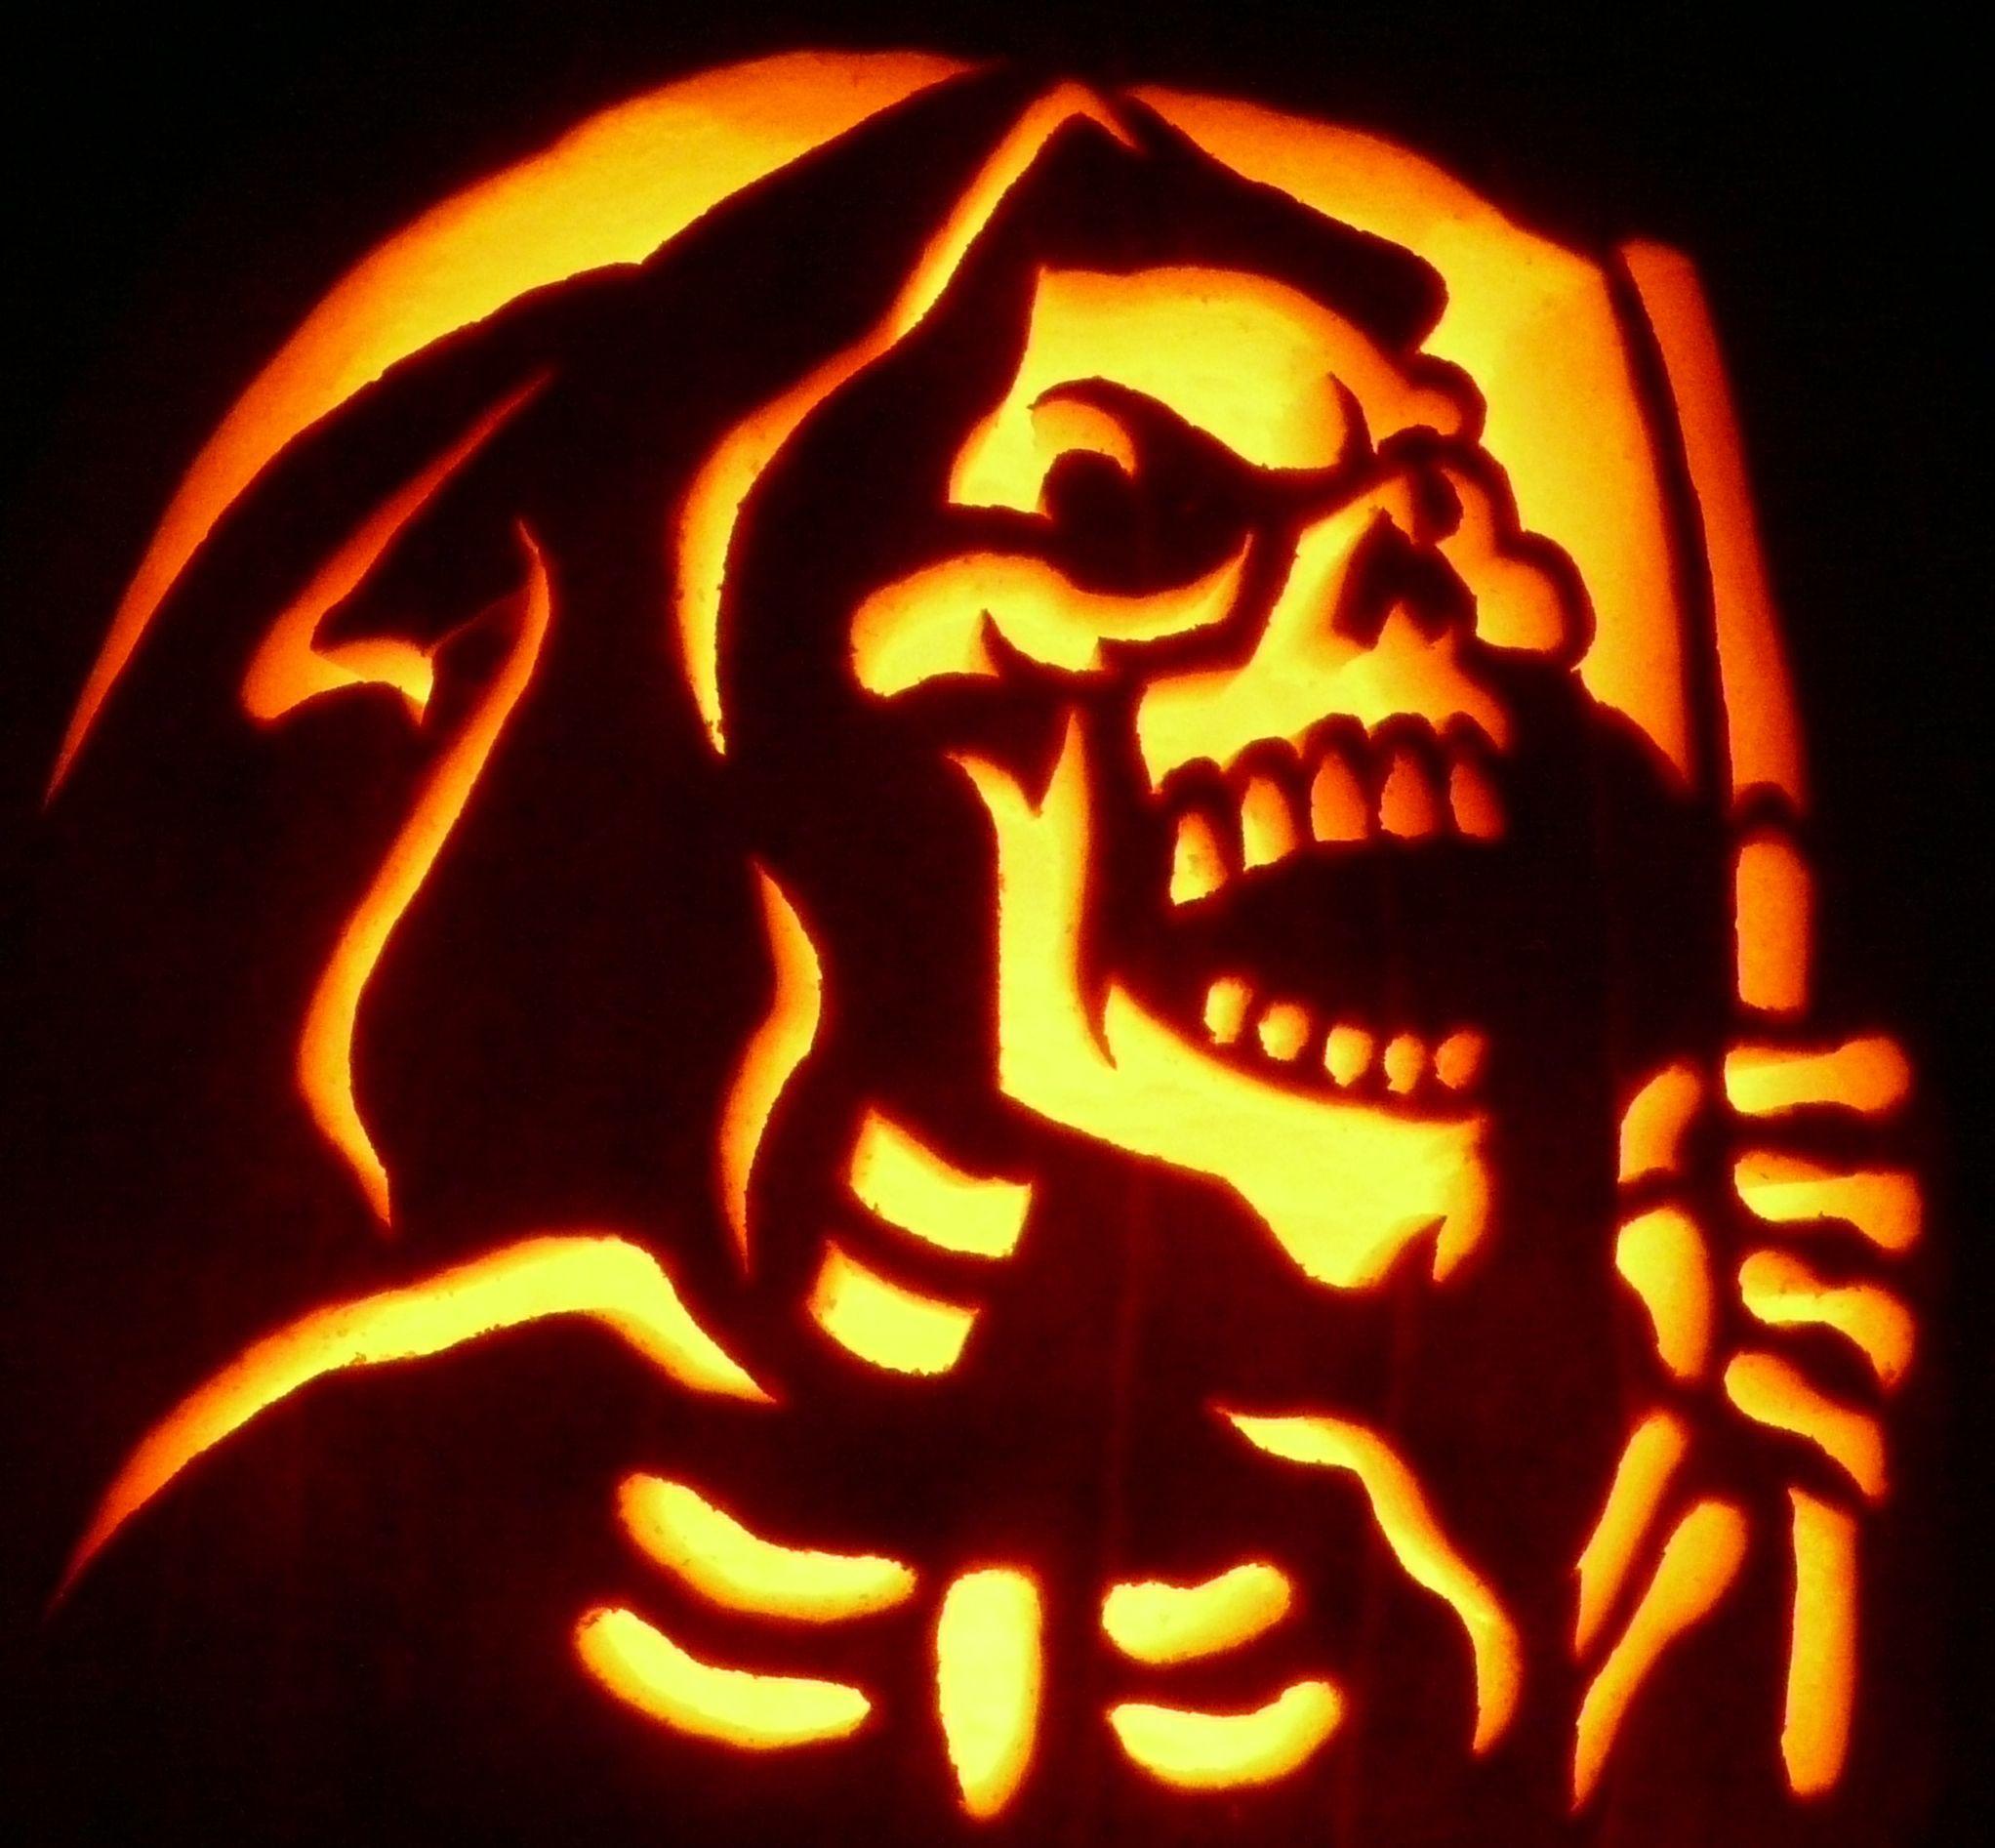 grim reaper pumpkin template  Carved Pumpkin- The Grim Reaper. Pattern by zombiepumpkins ...